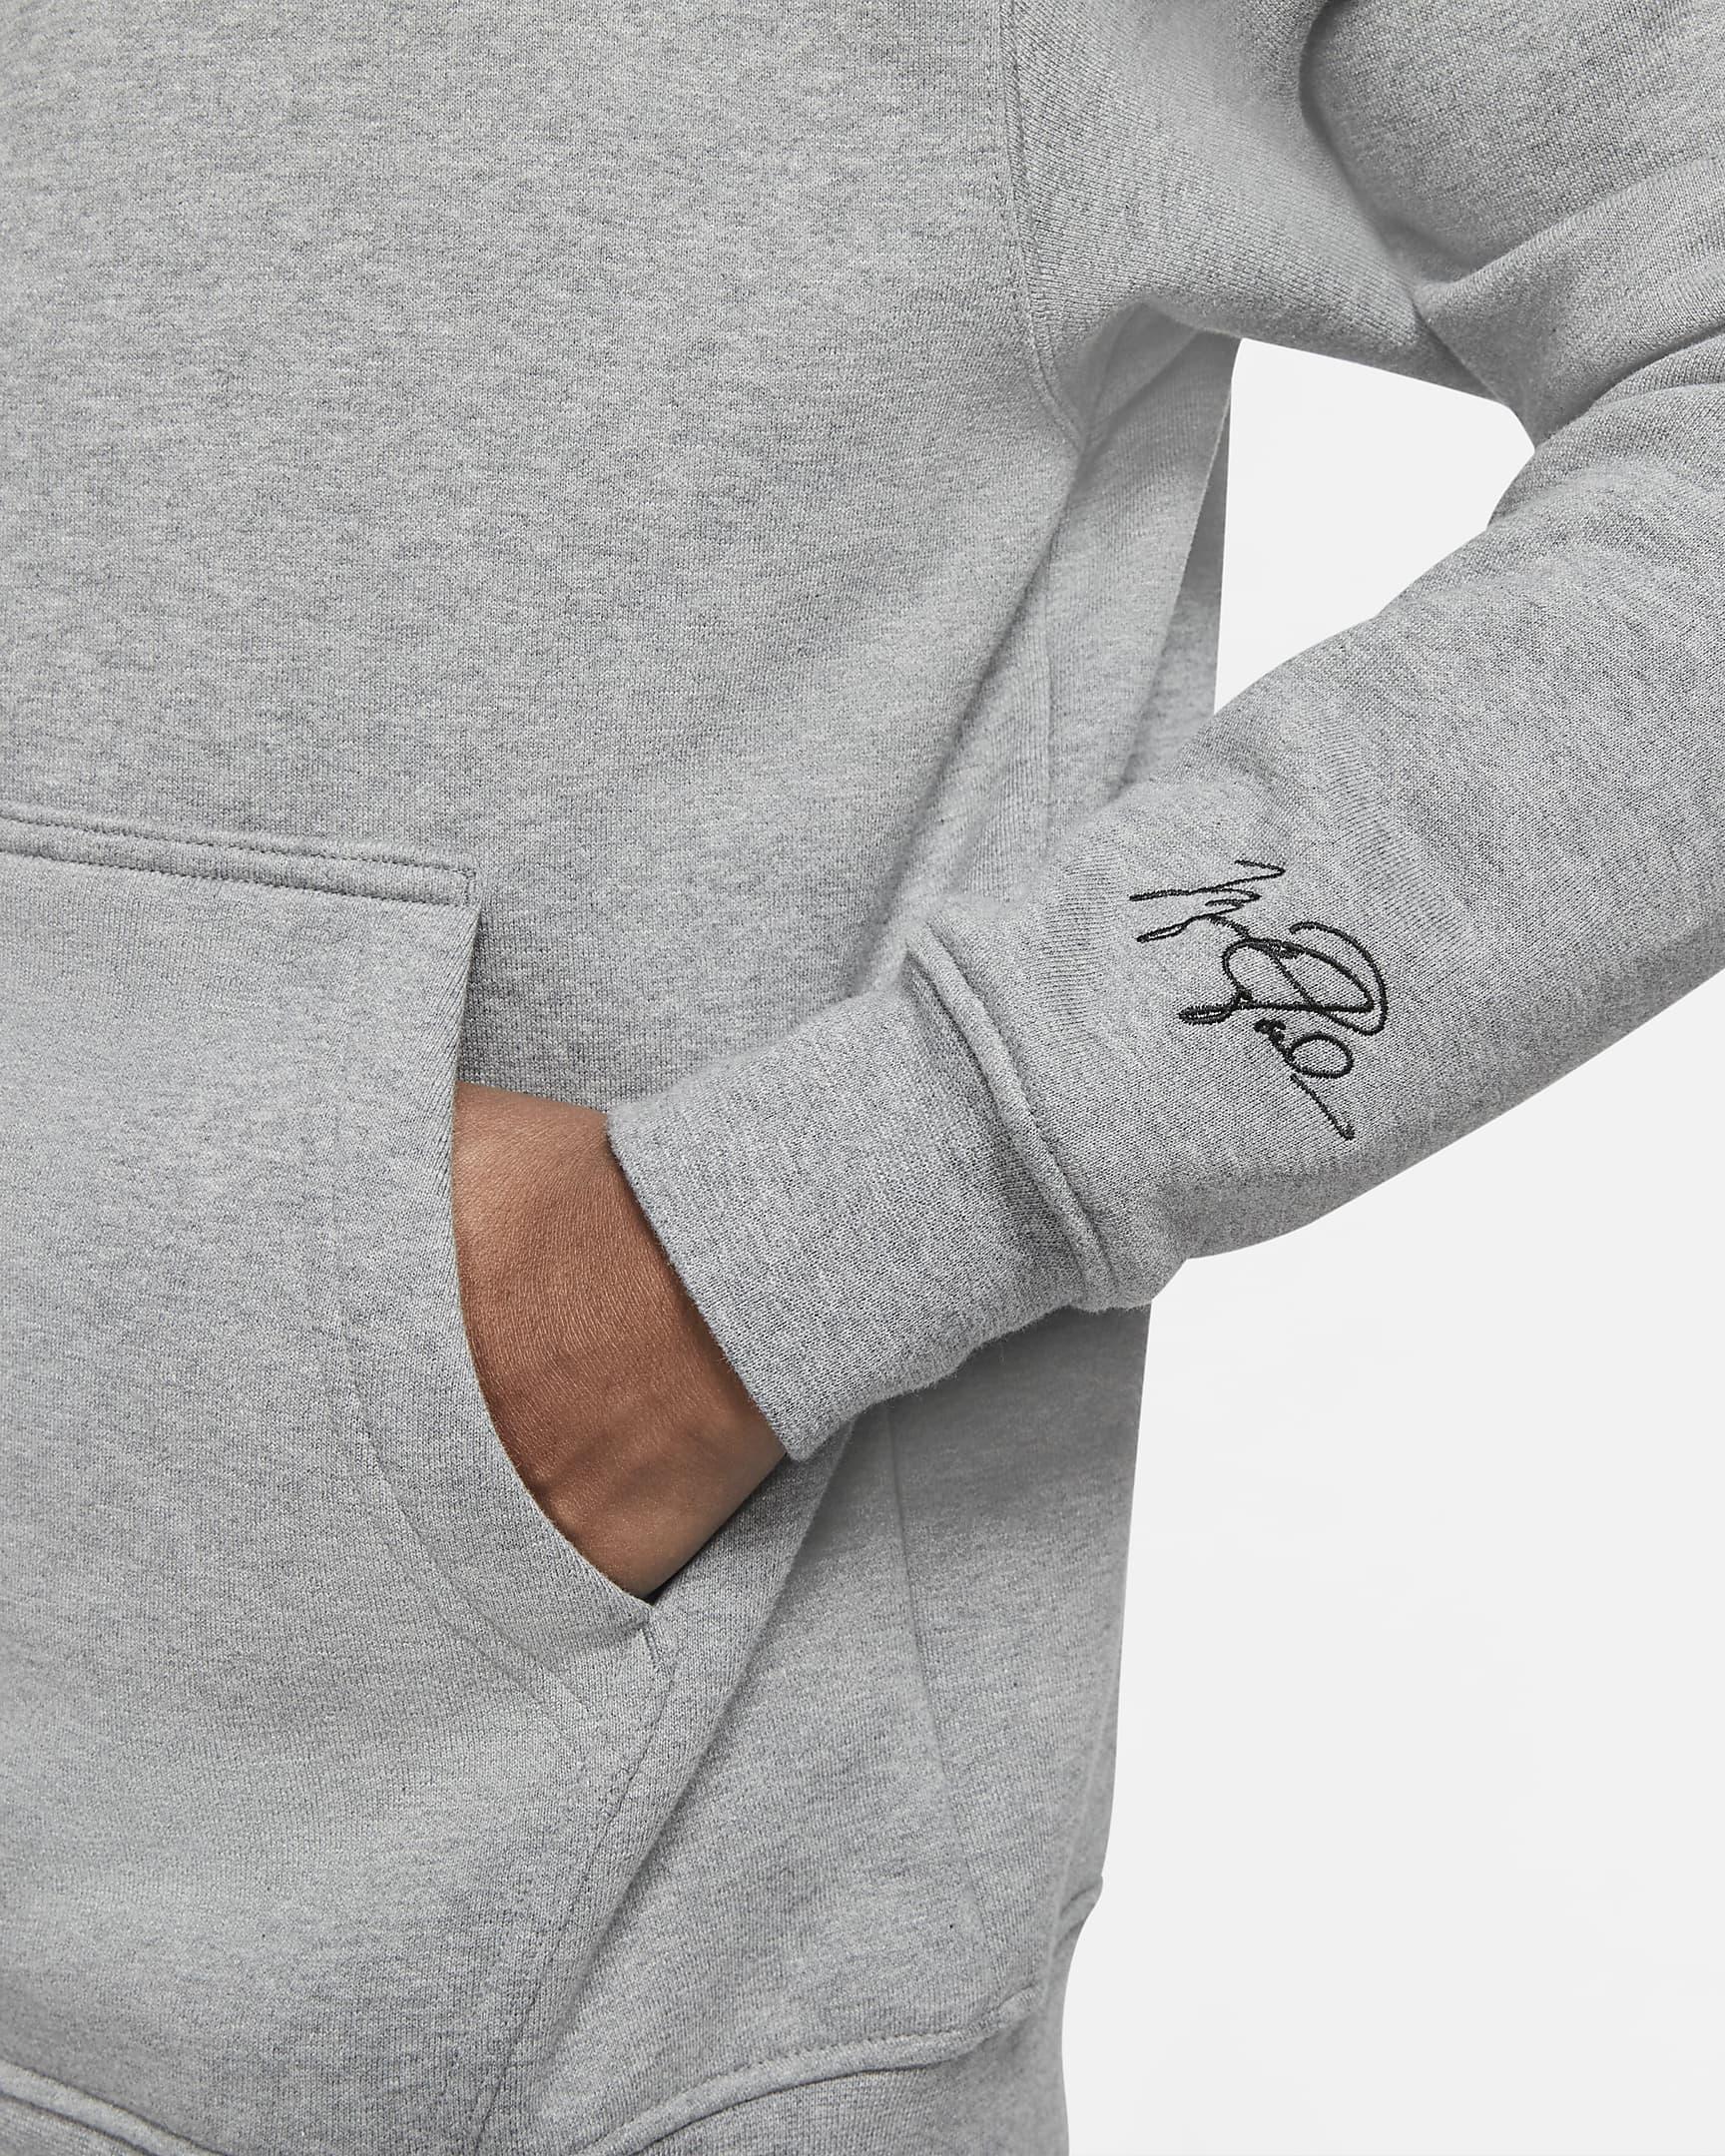 jordan-essentials-mens-fleece-full-zip-hoodie-DKJfG9-2.png